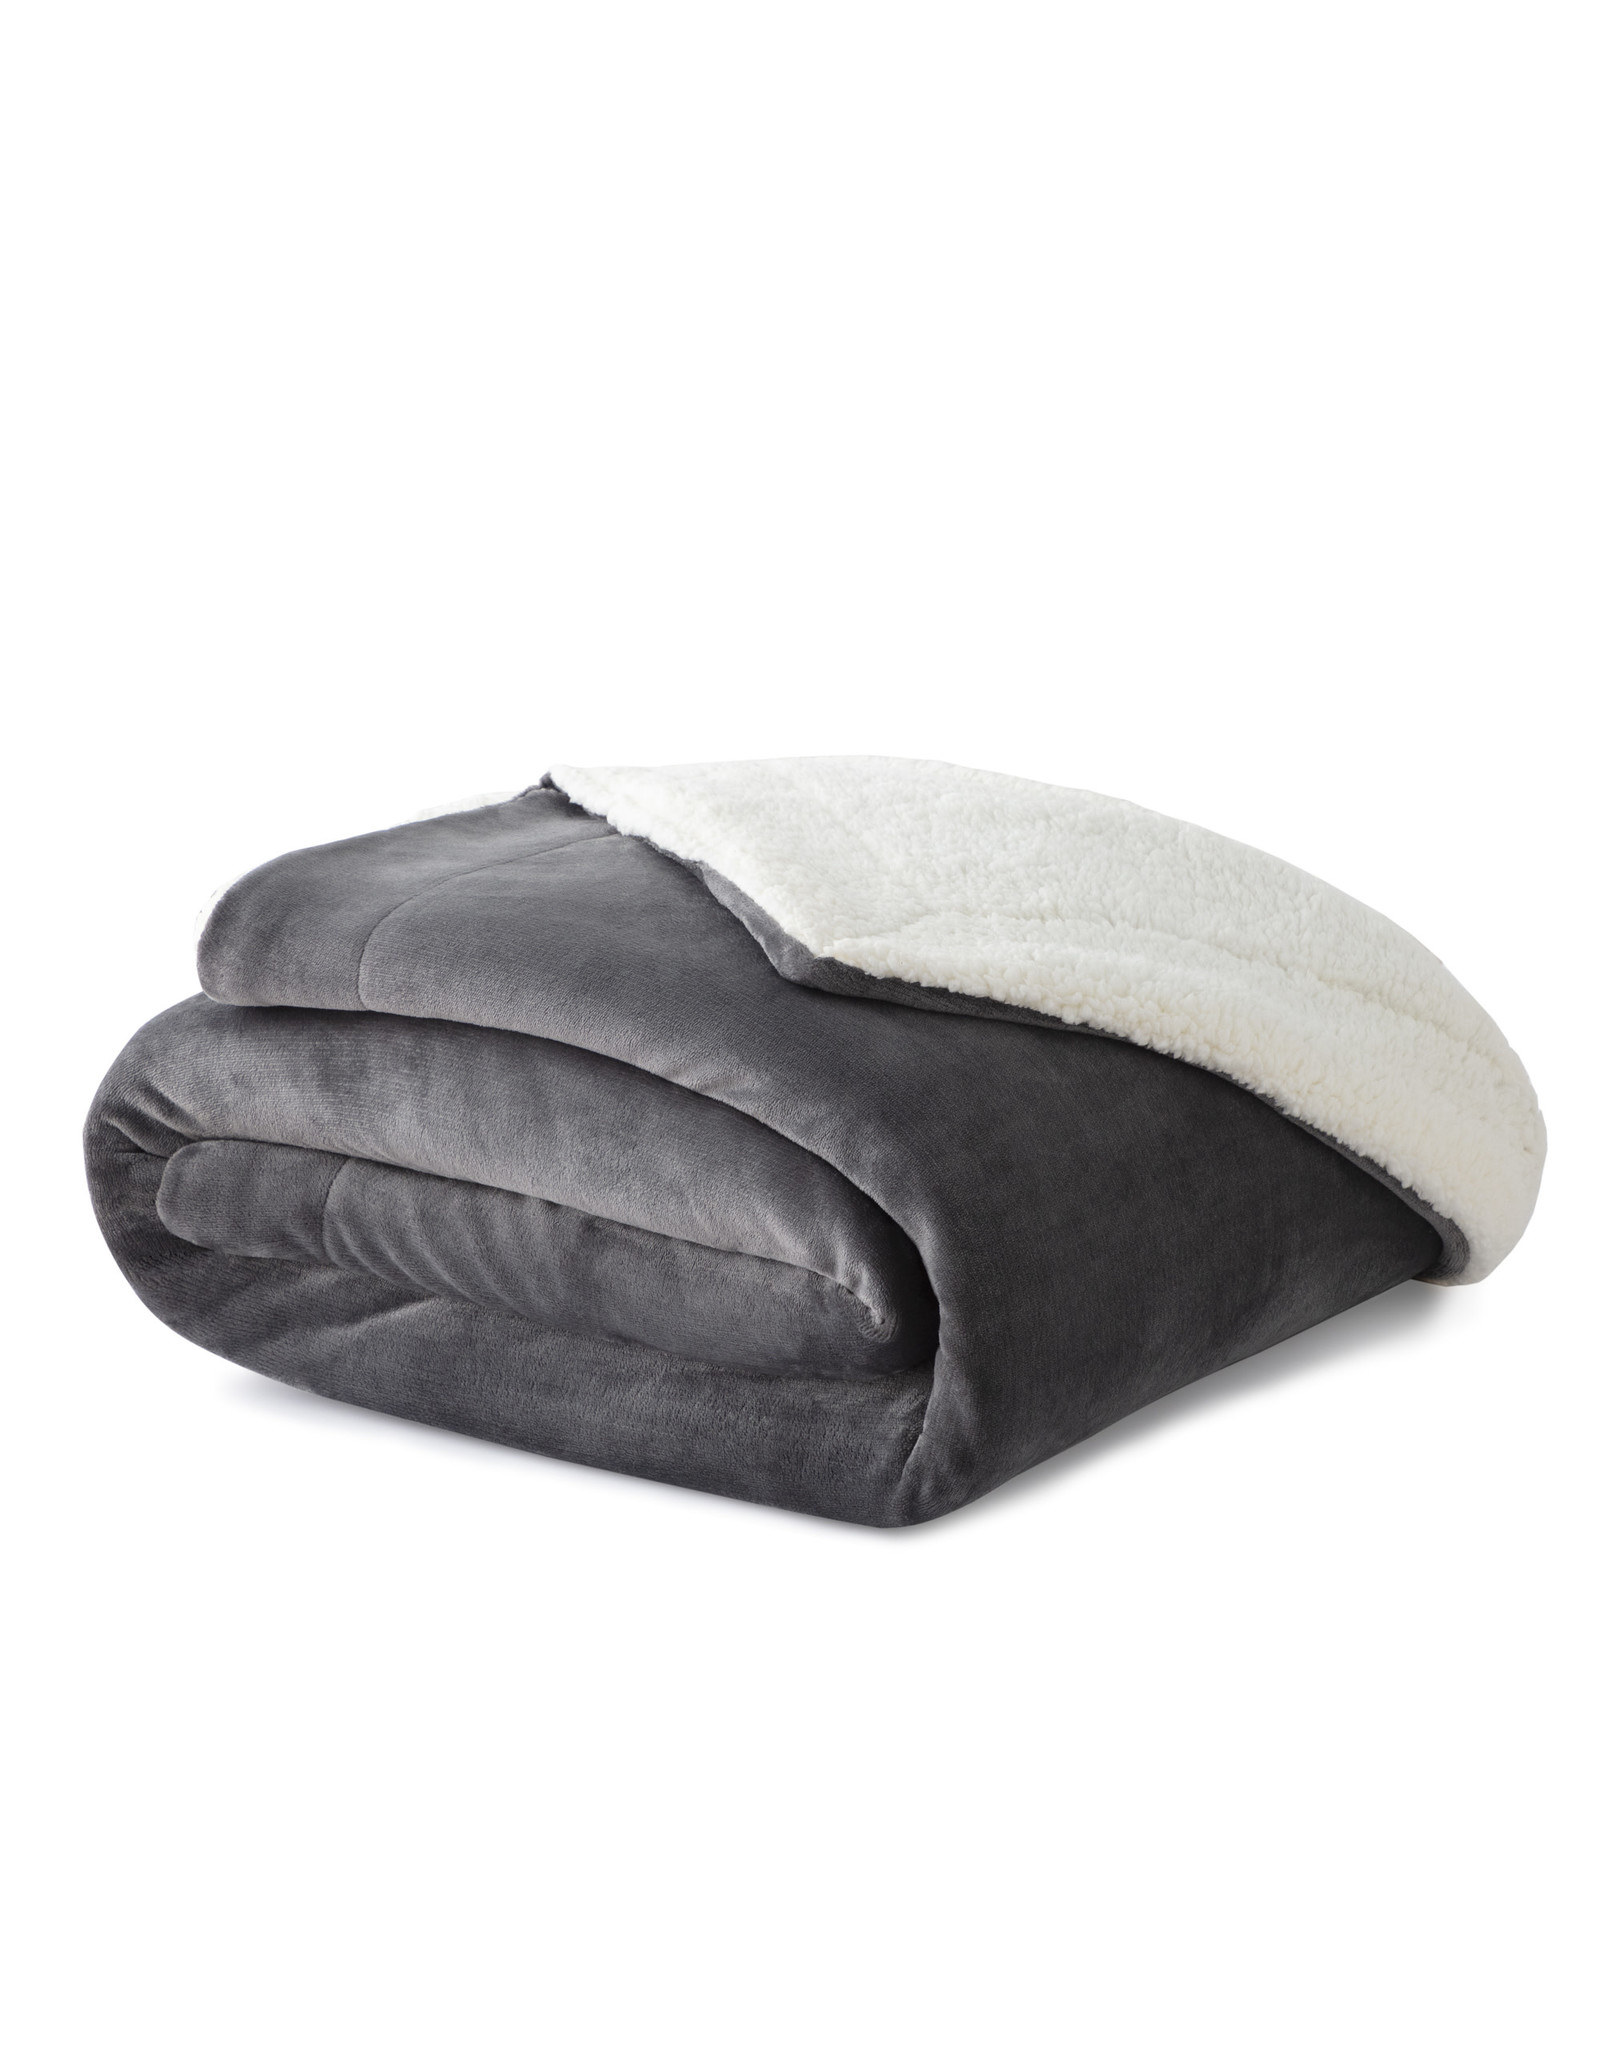 Malouf Sherpa Blanket - Gray